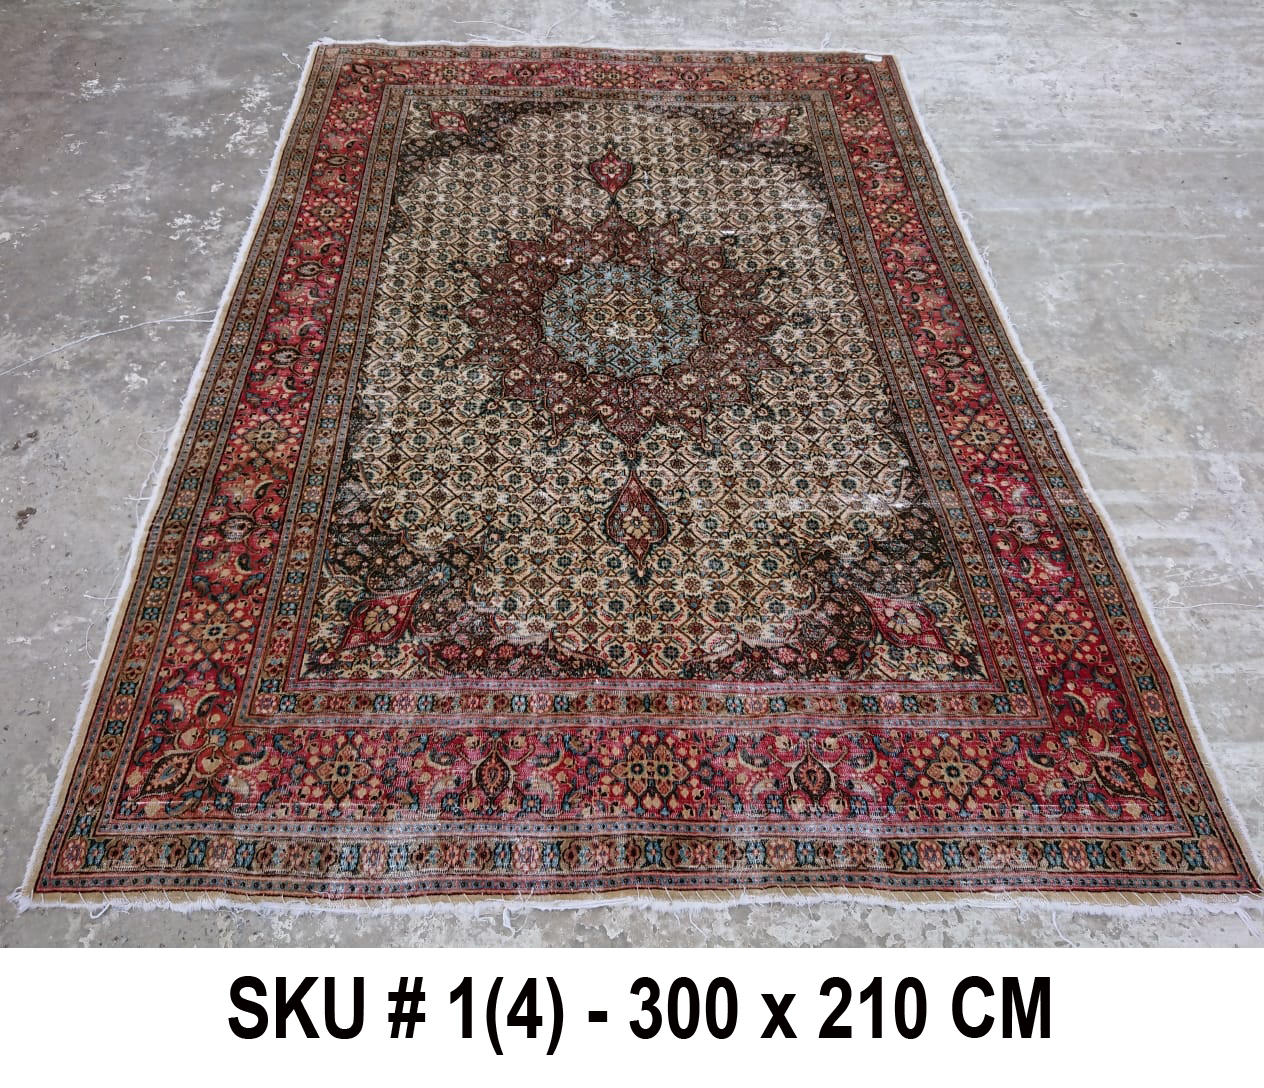 Vintage vloerkleed rood, nr.59005, 300cm x 210cm